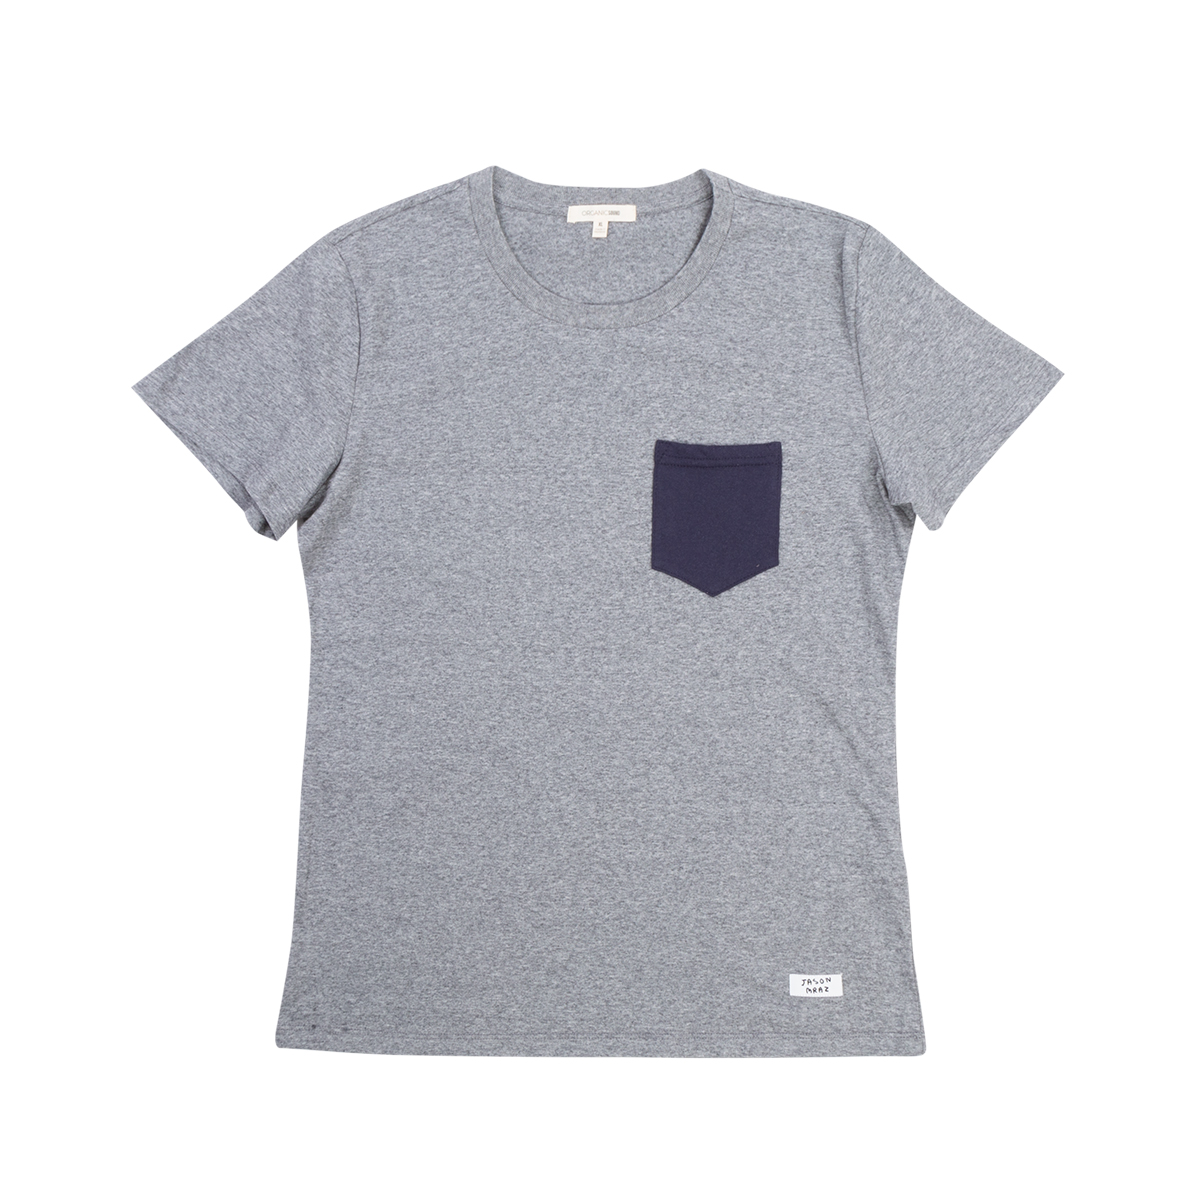 Jason Mraz Ladies Recycled Pocket T-shirt